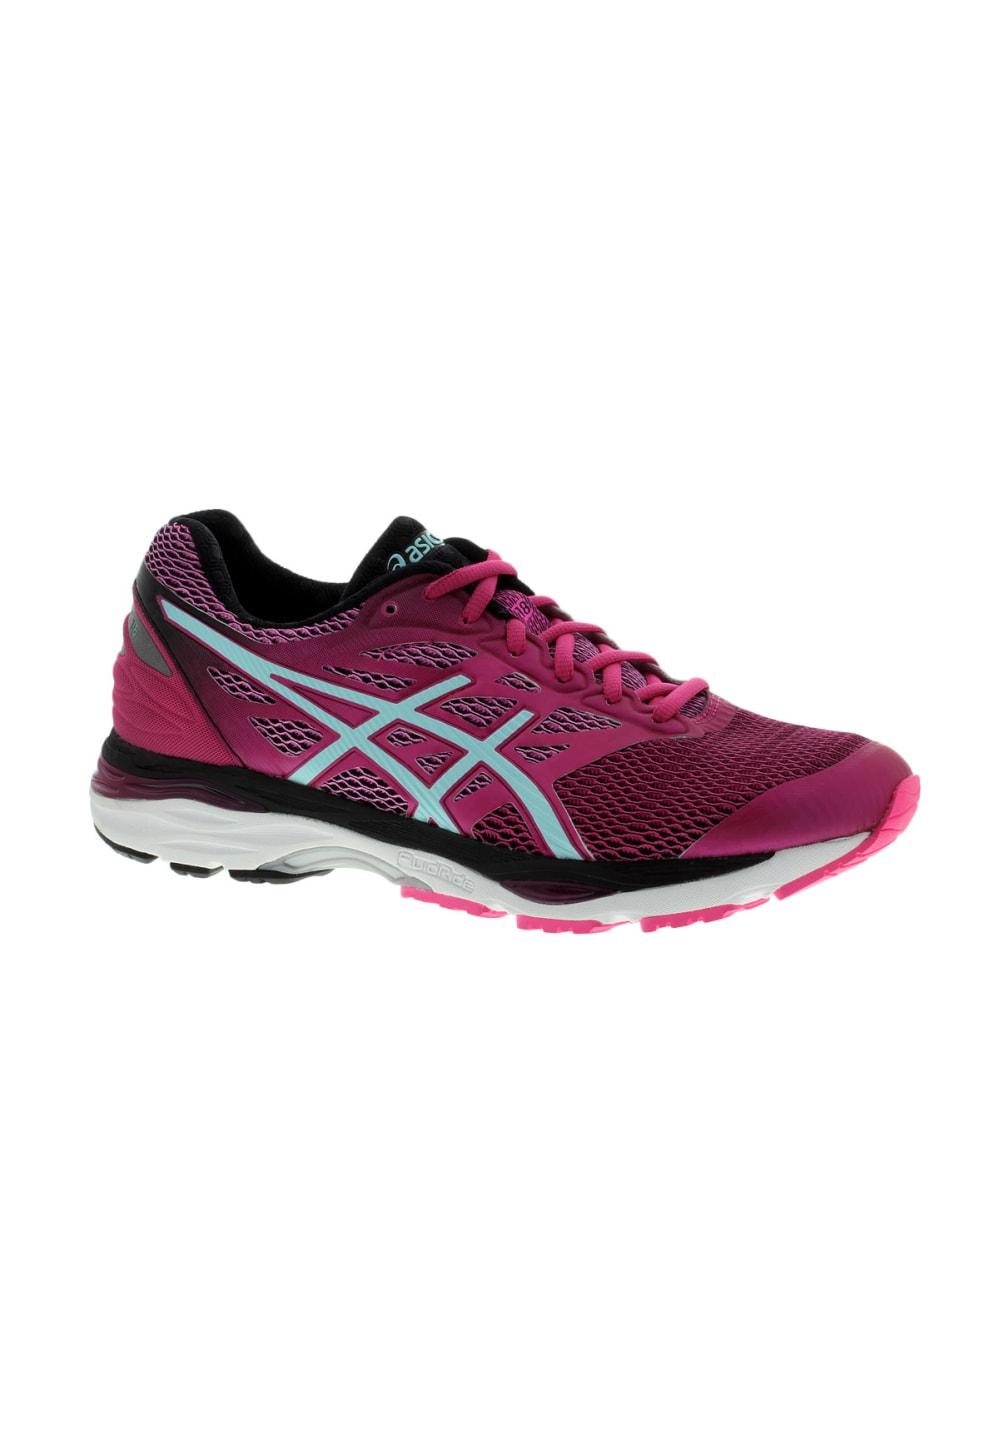 ASICS GEL-Cumulus 18 (2A) - Laufschuhe für Damen - Pink